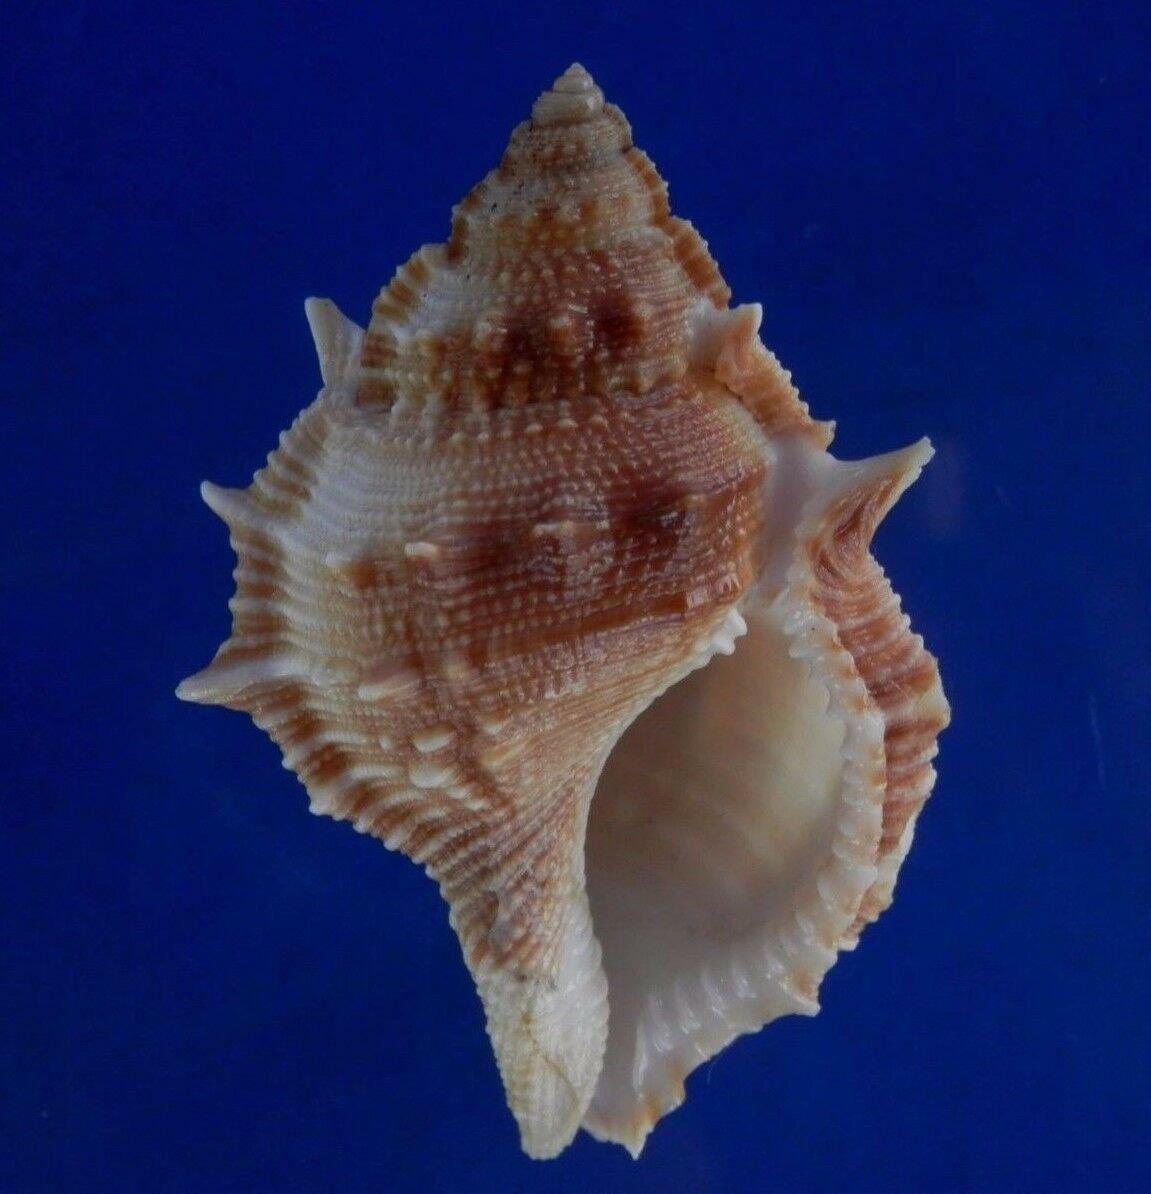 B294 77836 Seashell Bursa cristinae, 62 mm